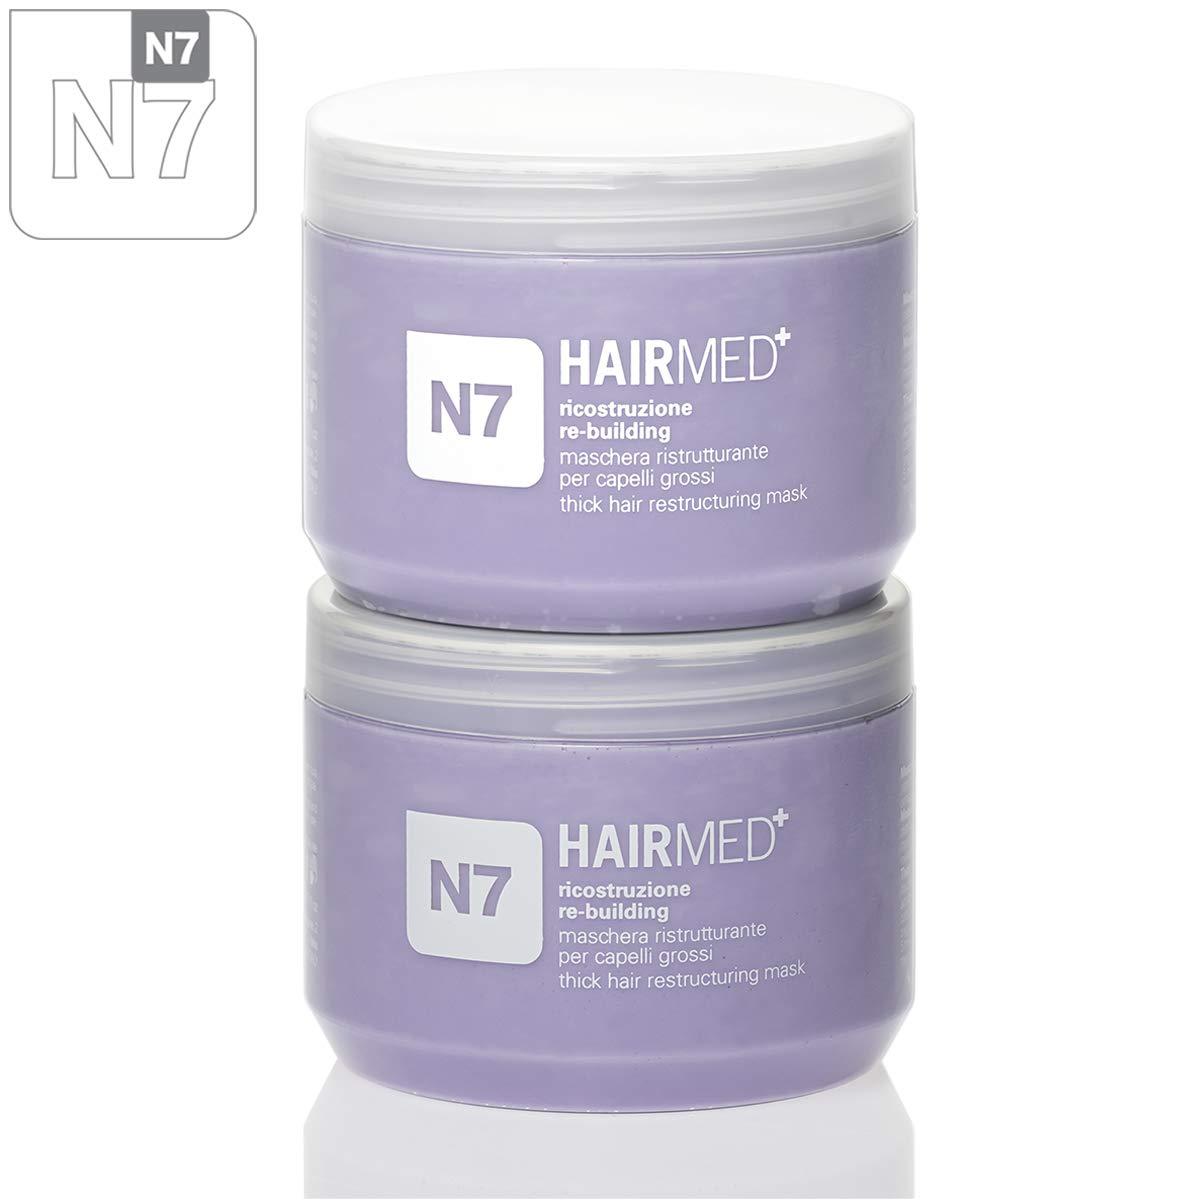 HAIRMED - Maschera professionale per capelli (Maschera Ricostruzione Cappeli Grossi N7, 250 ml) HAIRMED haircare innovative